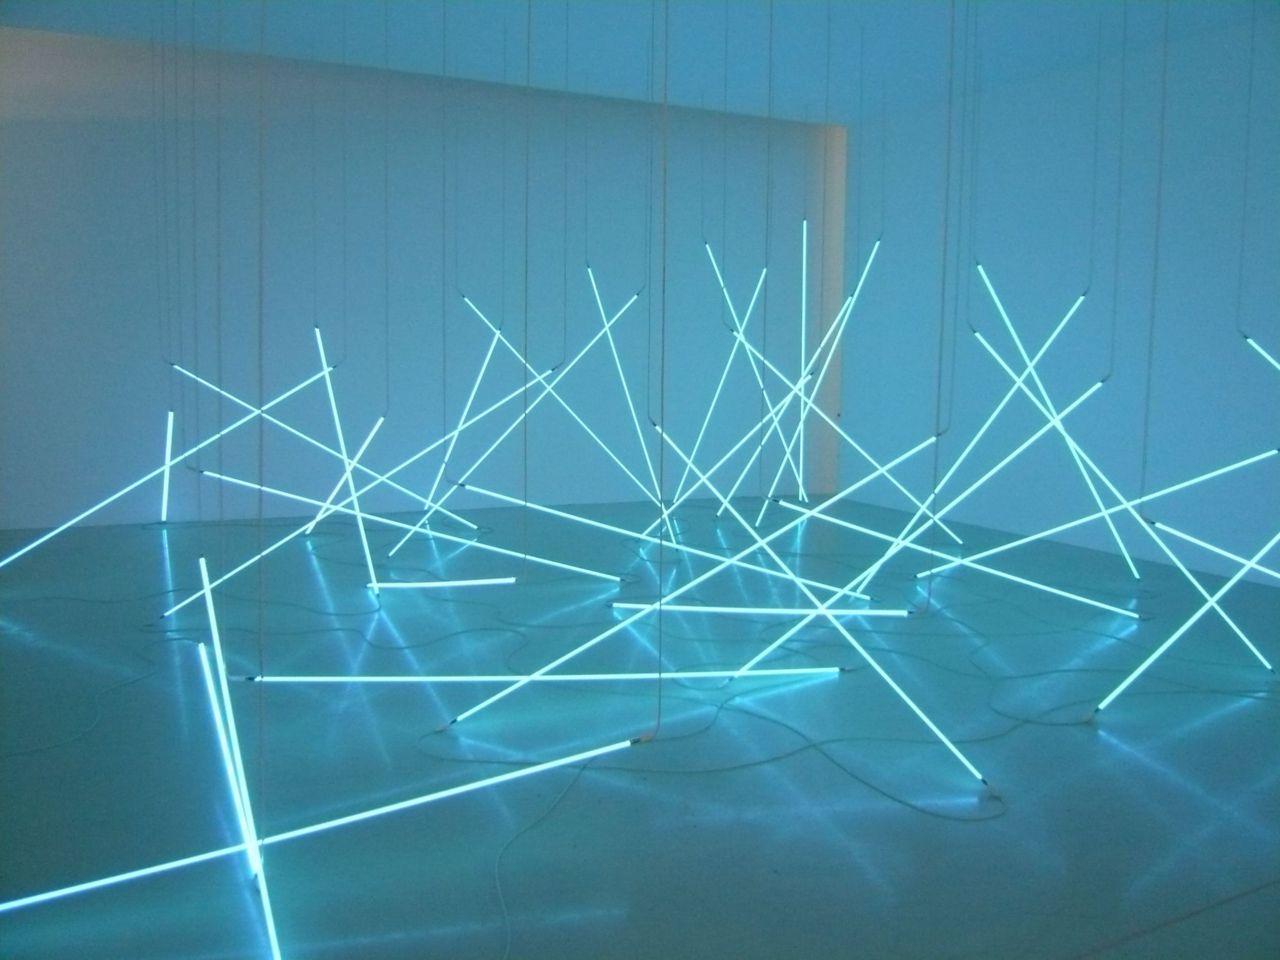 Inspiration: Light It Up   Art by Francois Morellet at Pompidou Center in Paris